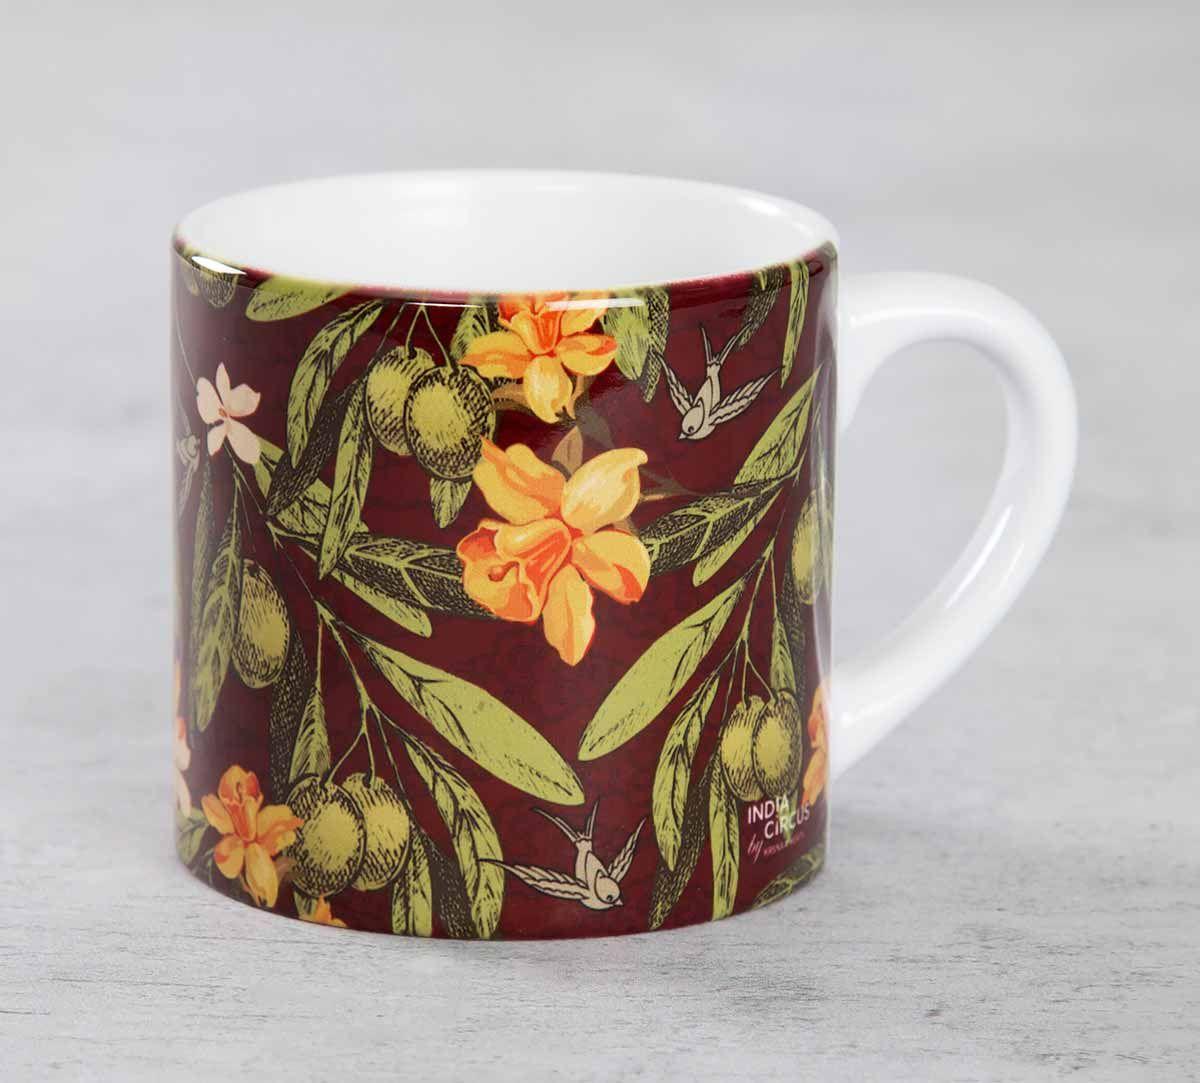 India Circus Hummingbird Hemmingway Espresso Mug